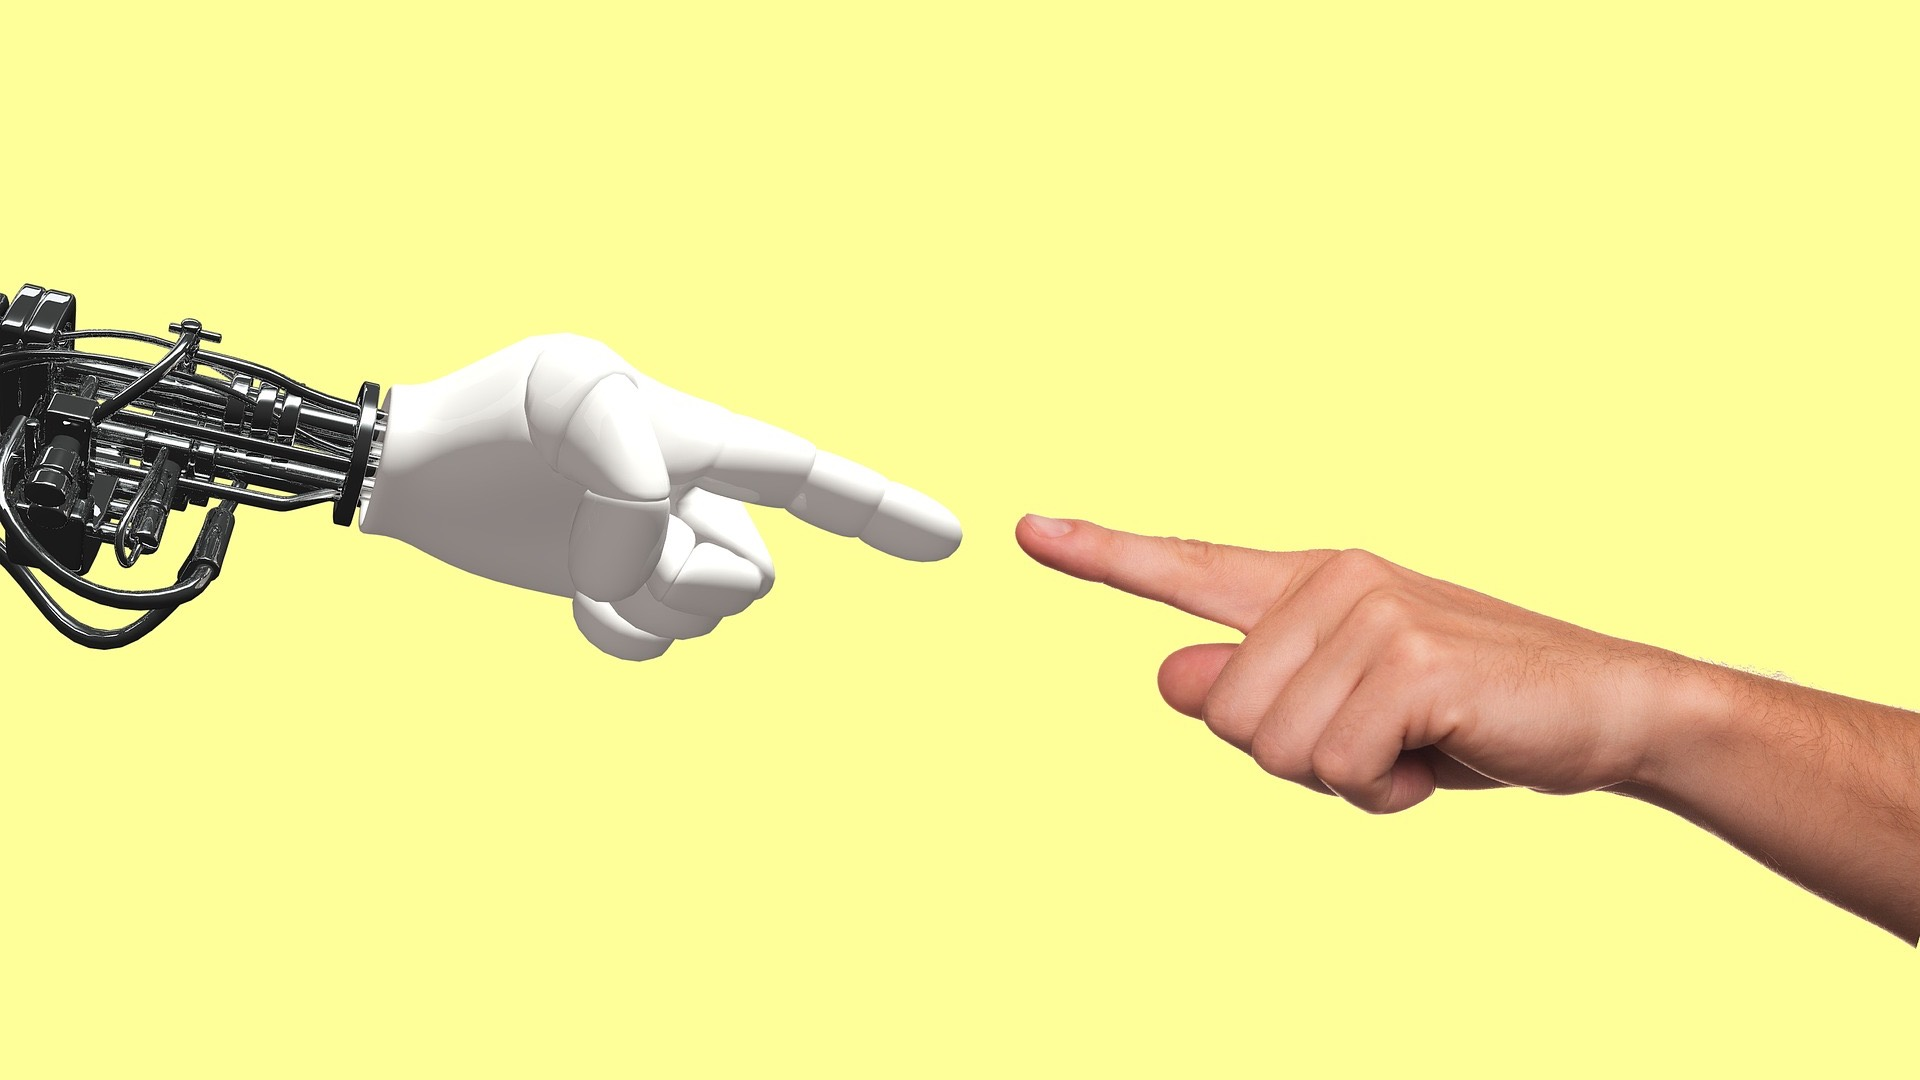 Google creates its own AI rulebook - promises it won't go all Terminator on us